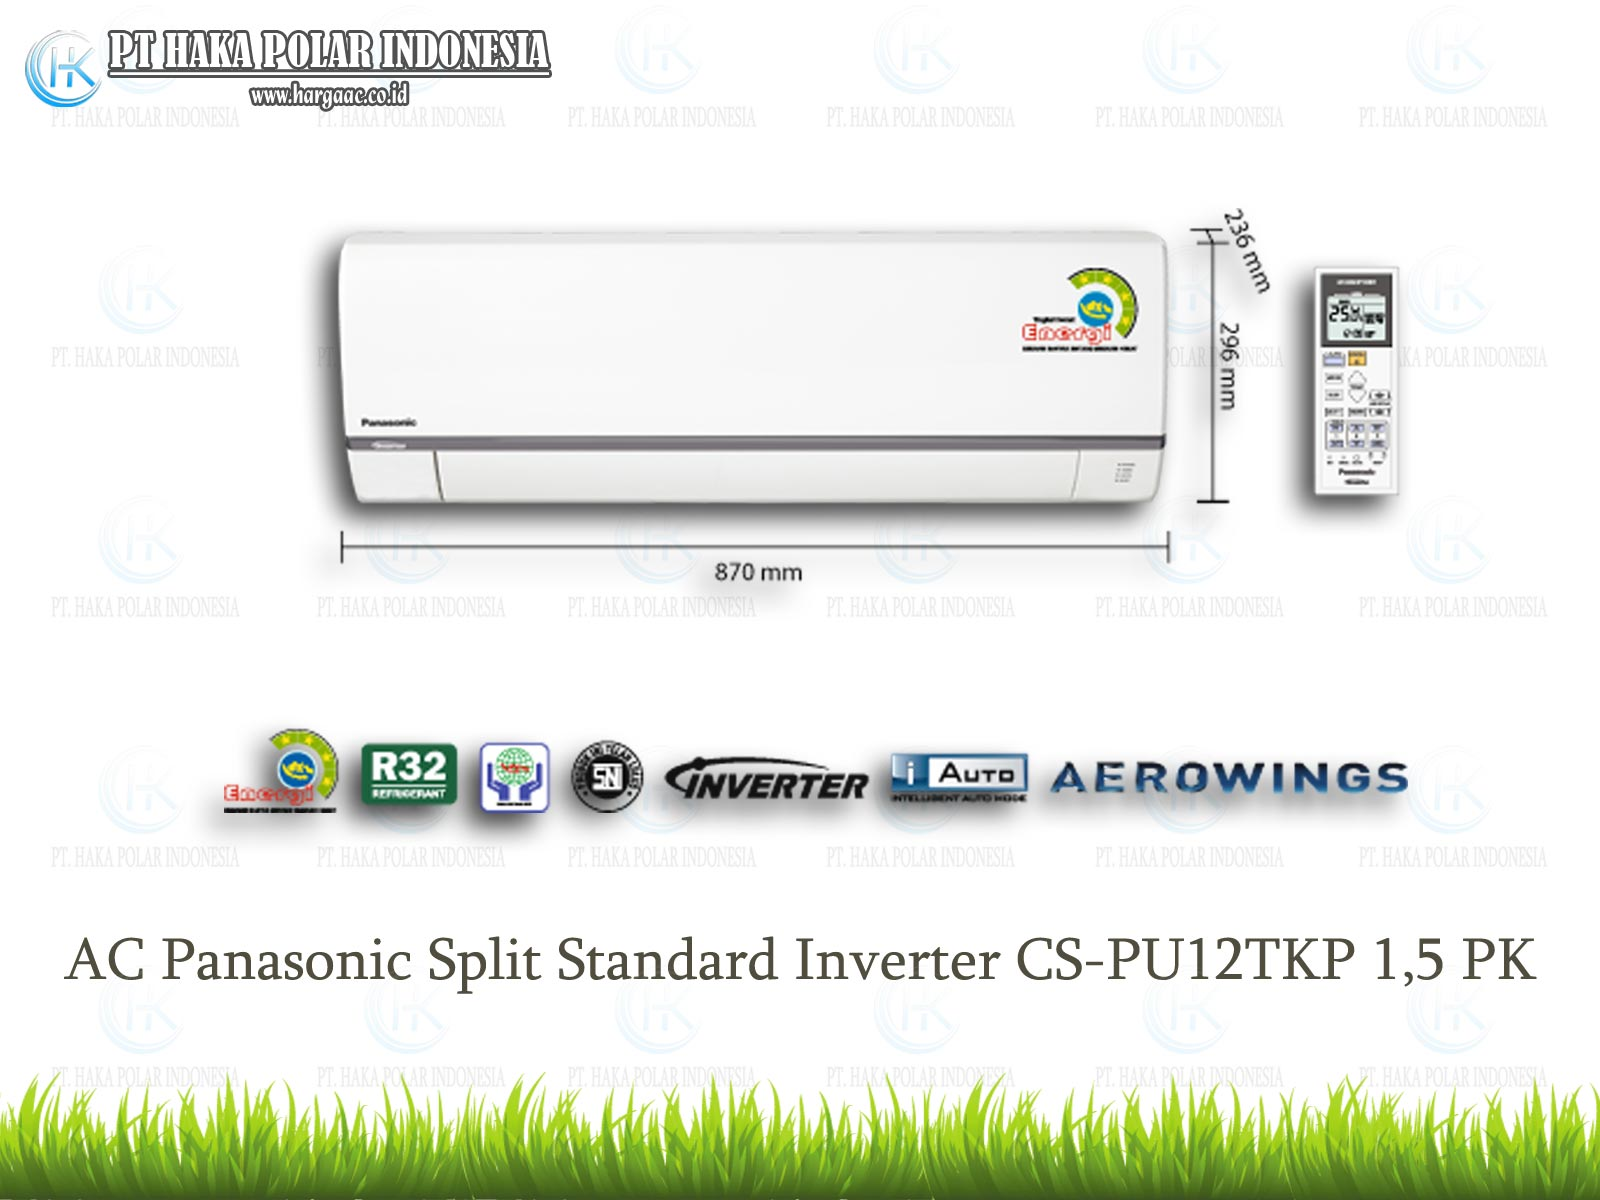 Spesifikasi AC Panasonic CS PU12UKP 1 2 PK Split Standar Inverter R32